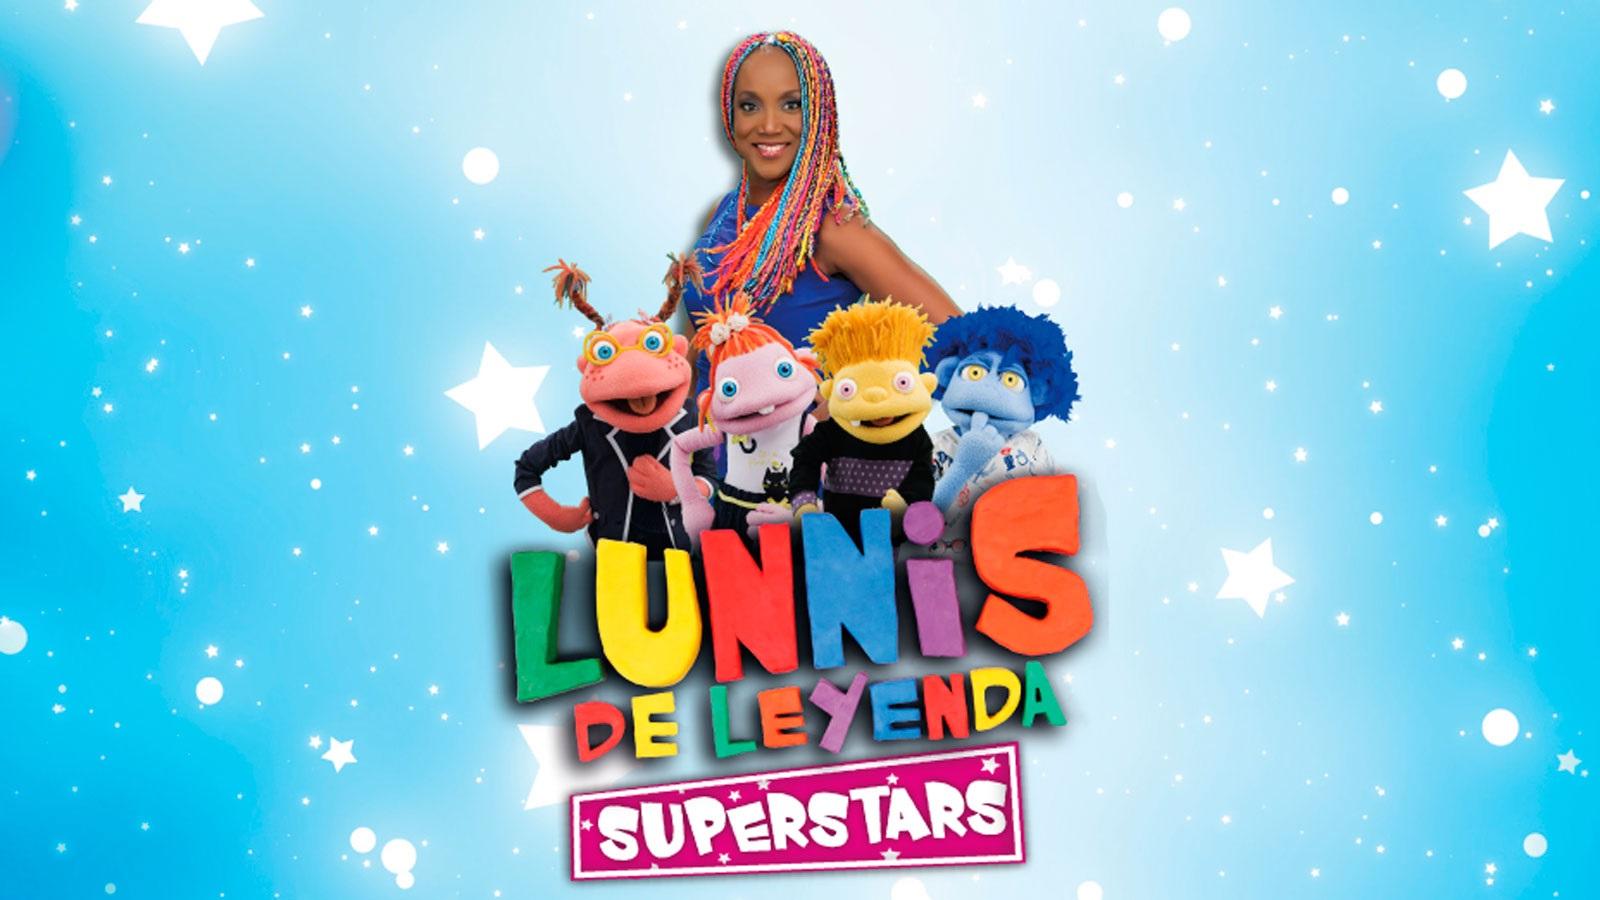 Lunnis de Leyenda Superstars ¡en vivo!